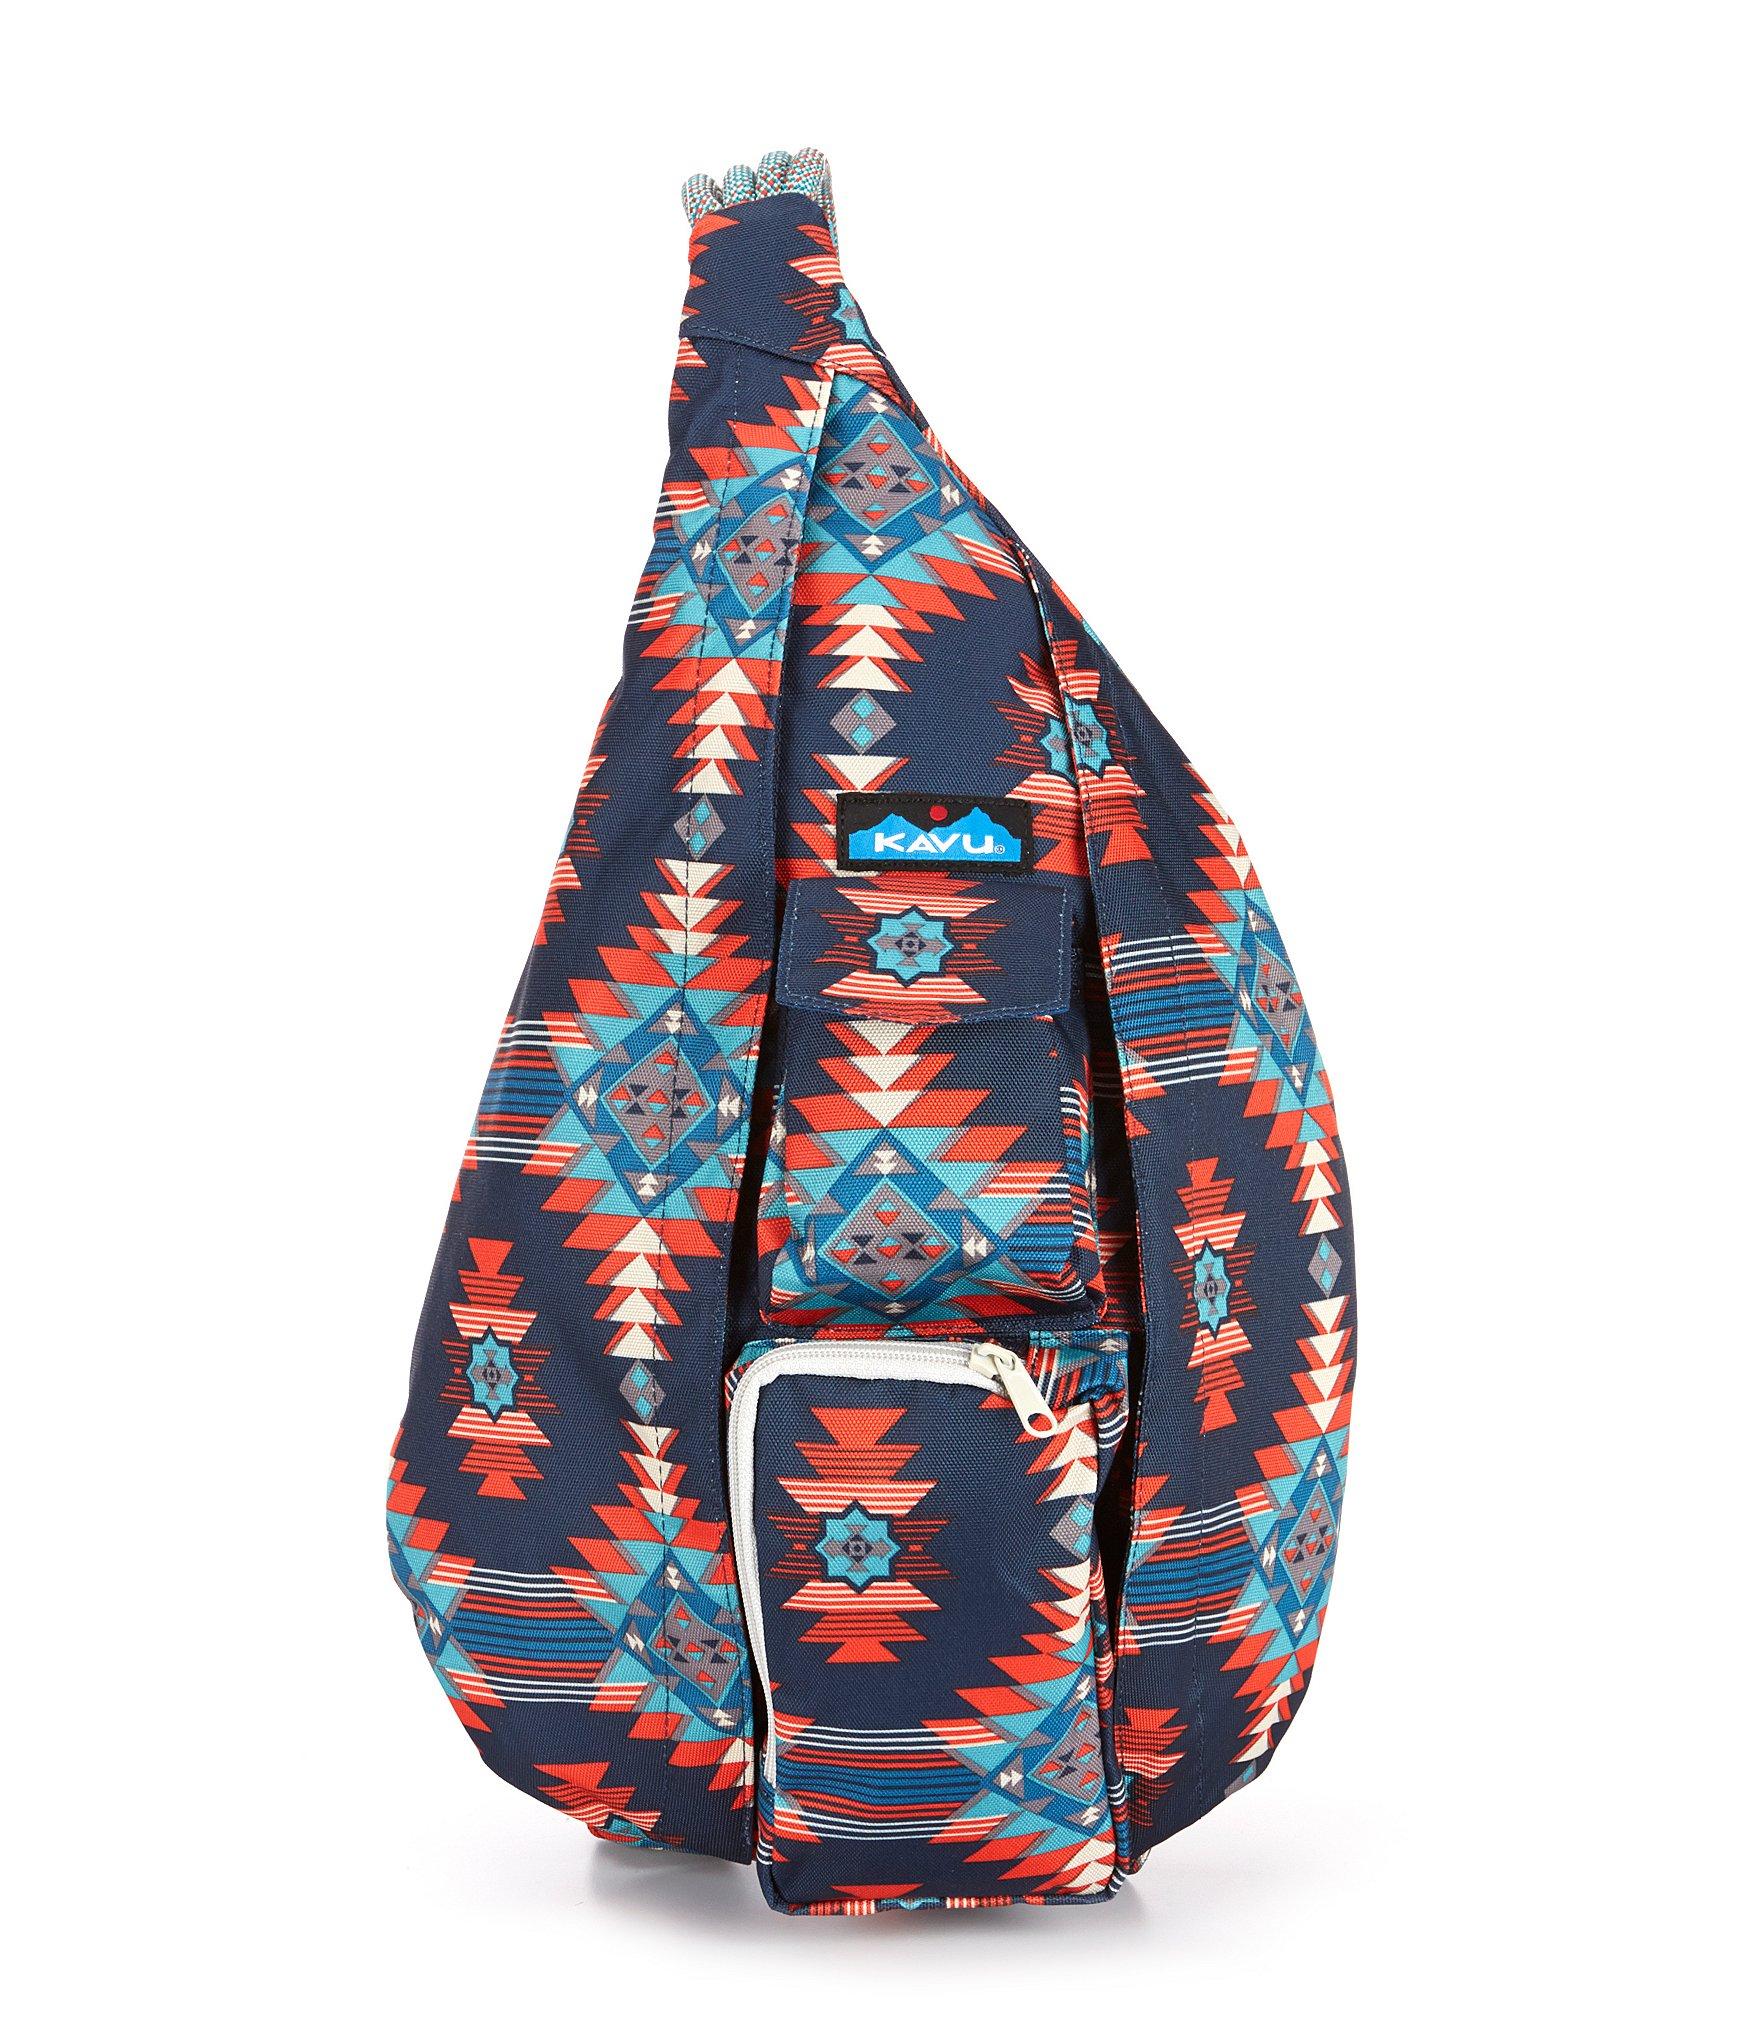 Galerry kavu rope sling bags